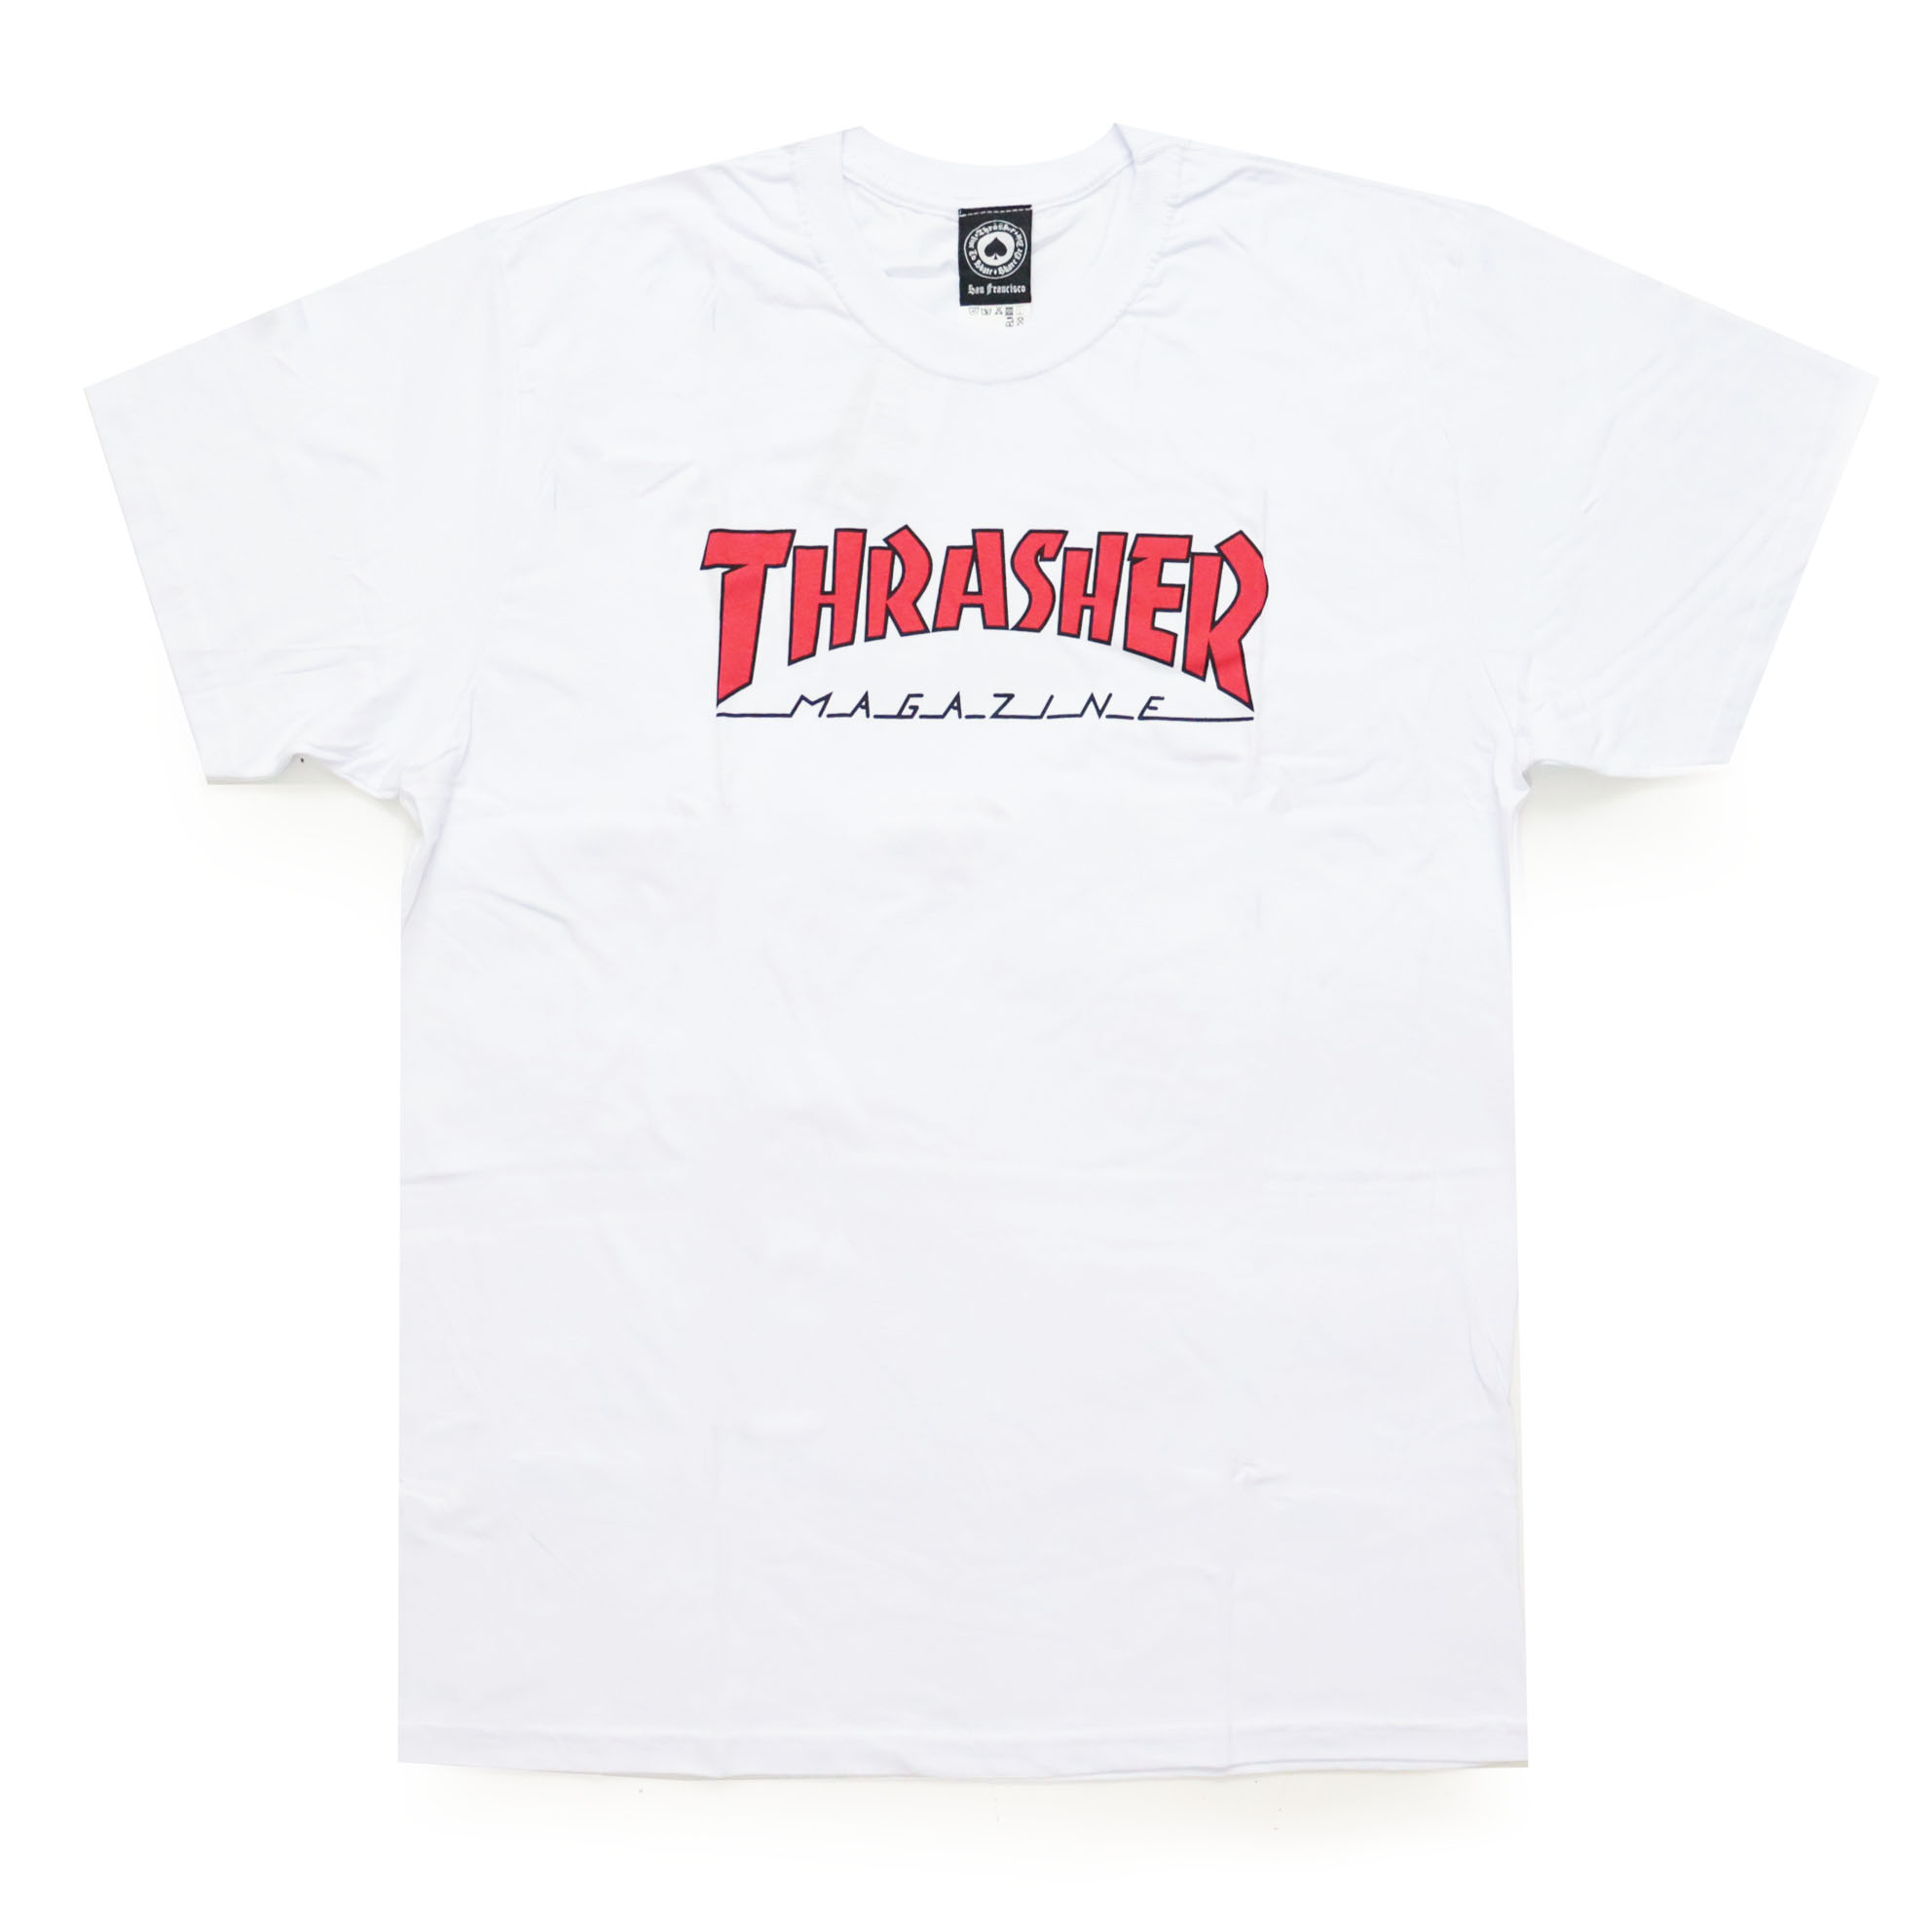 Camiseta Thrasher Magazine Outlined - Branco/Vermelho